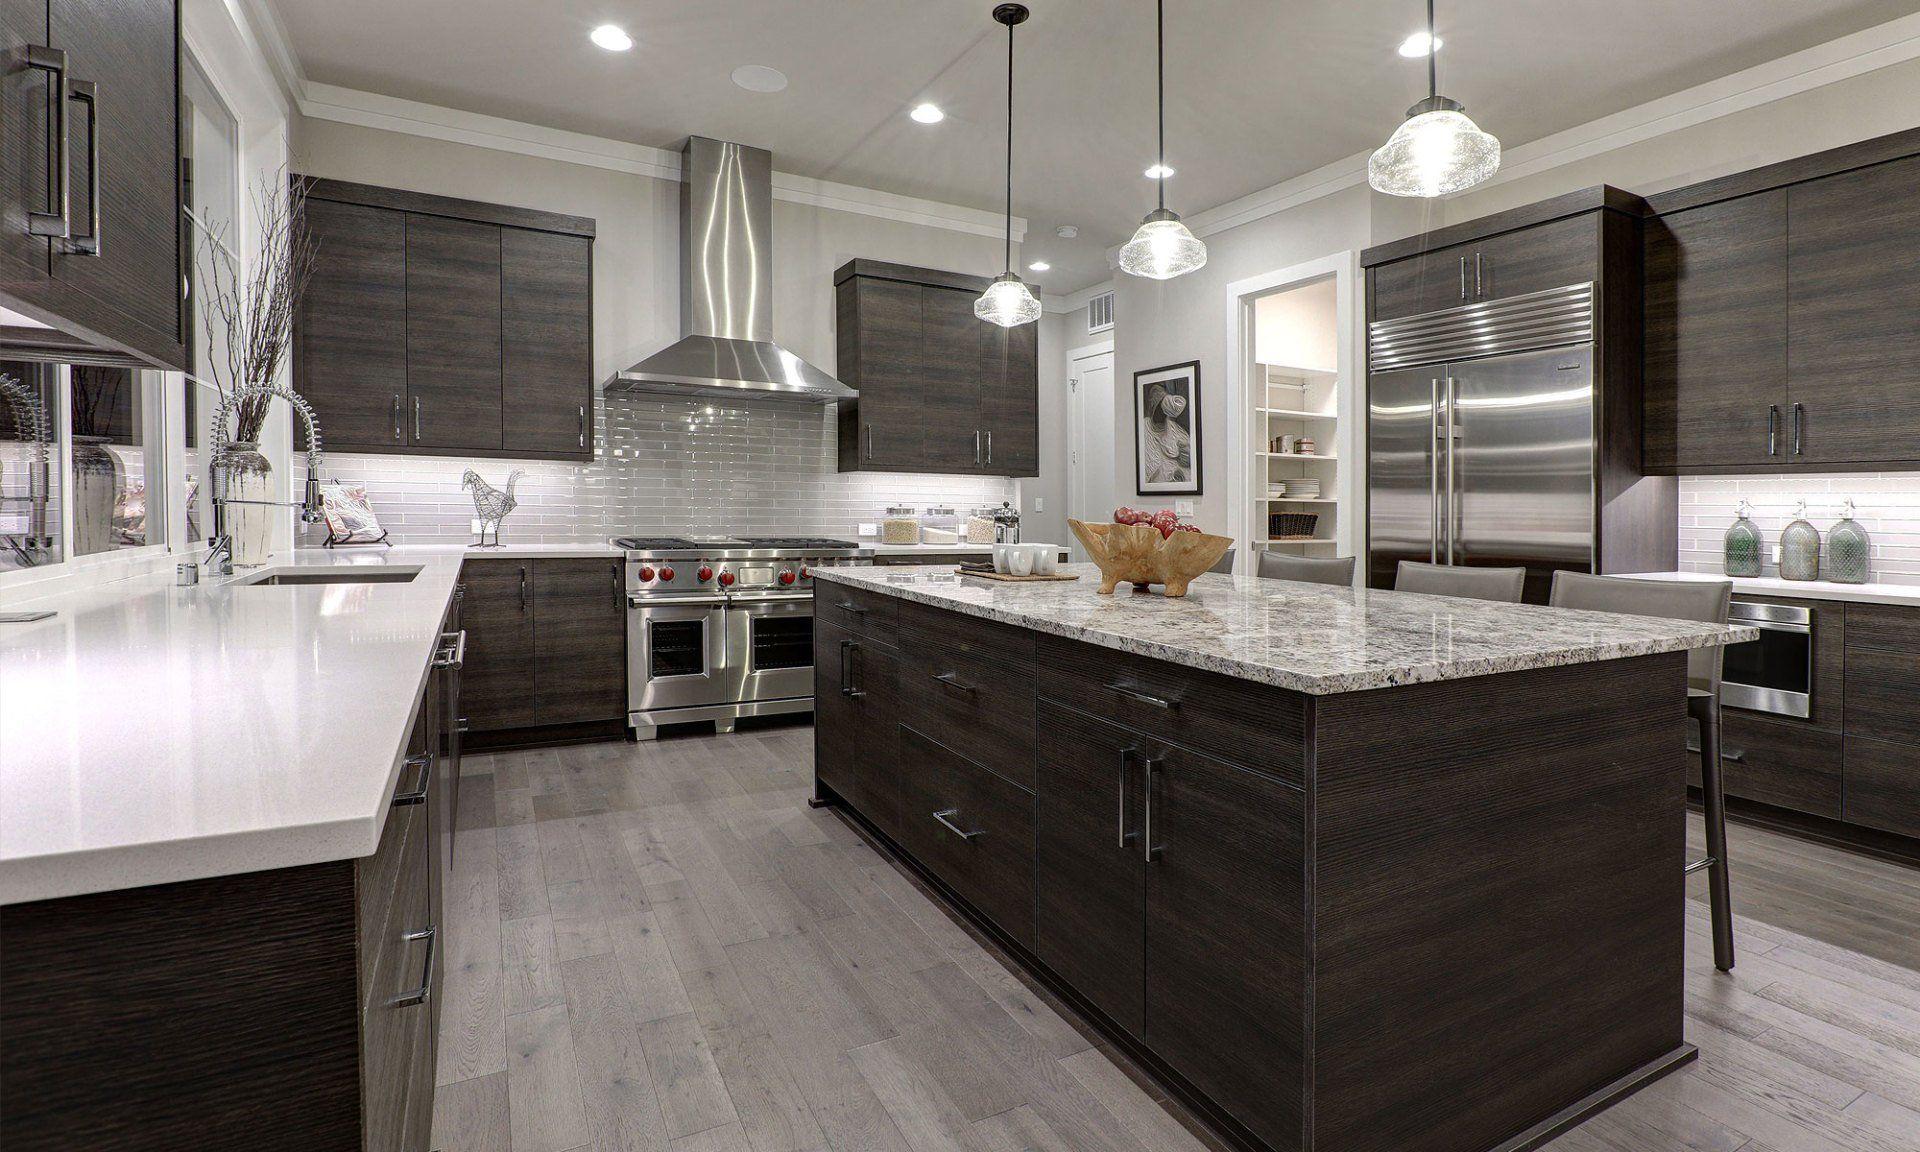 South Hills Pittsburgh Kitchen Remodeling | Kitchen Design ...